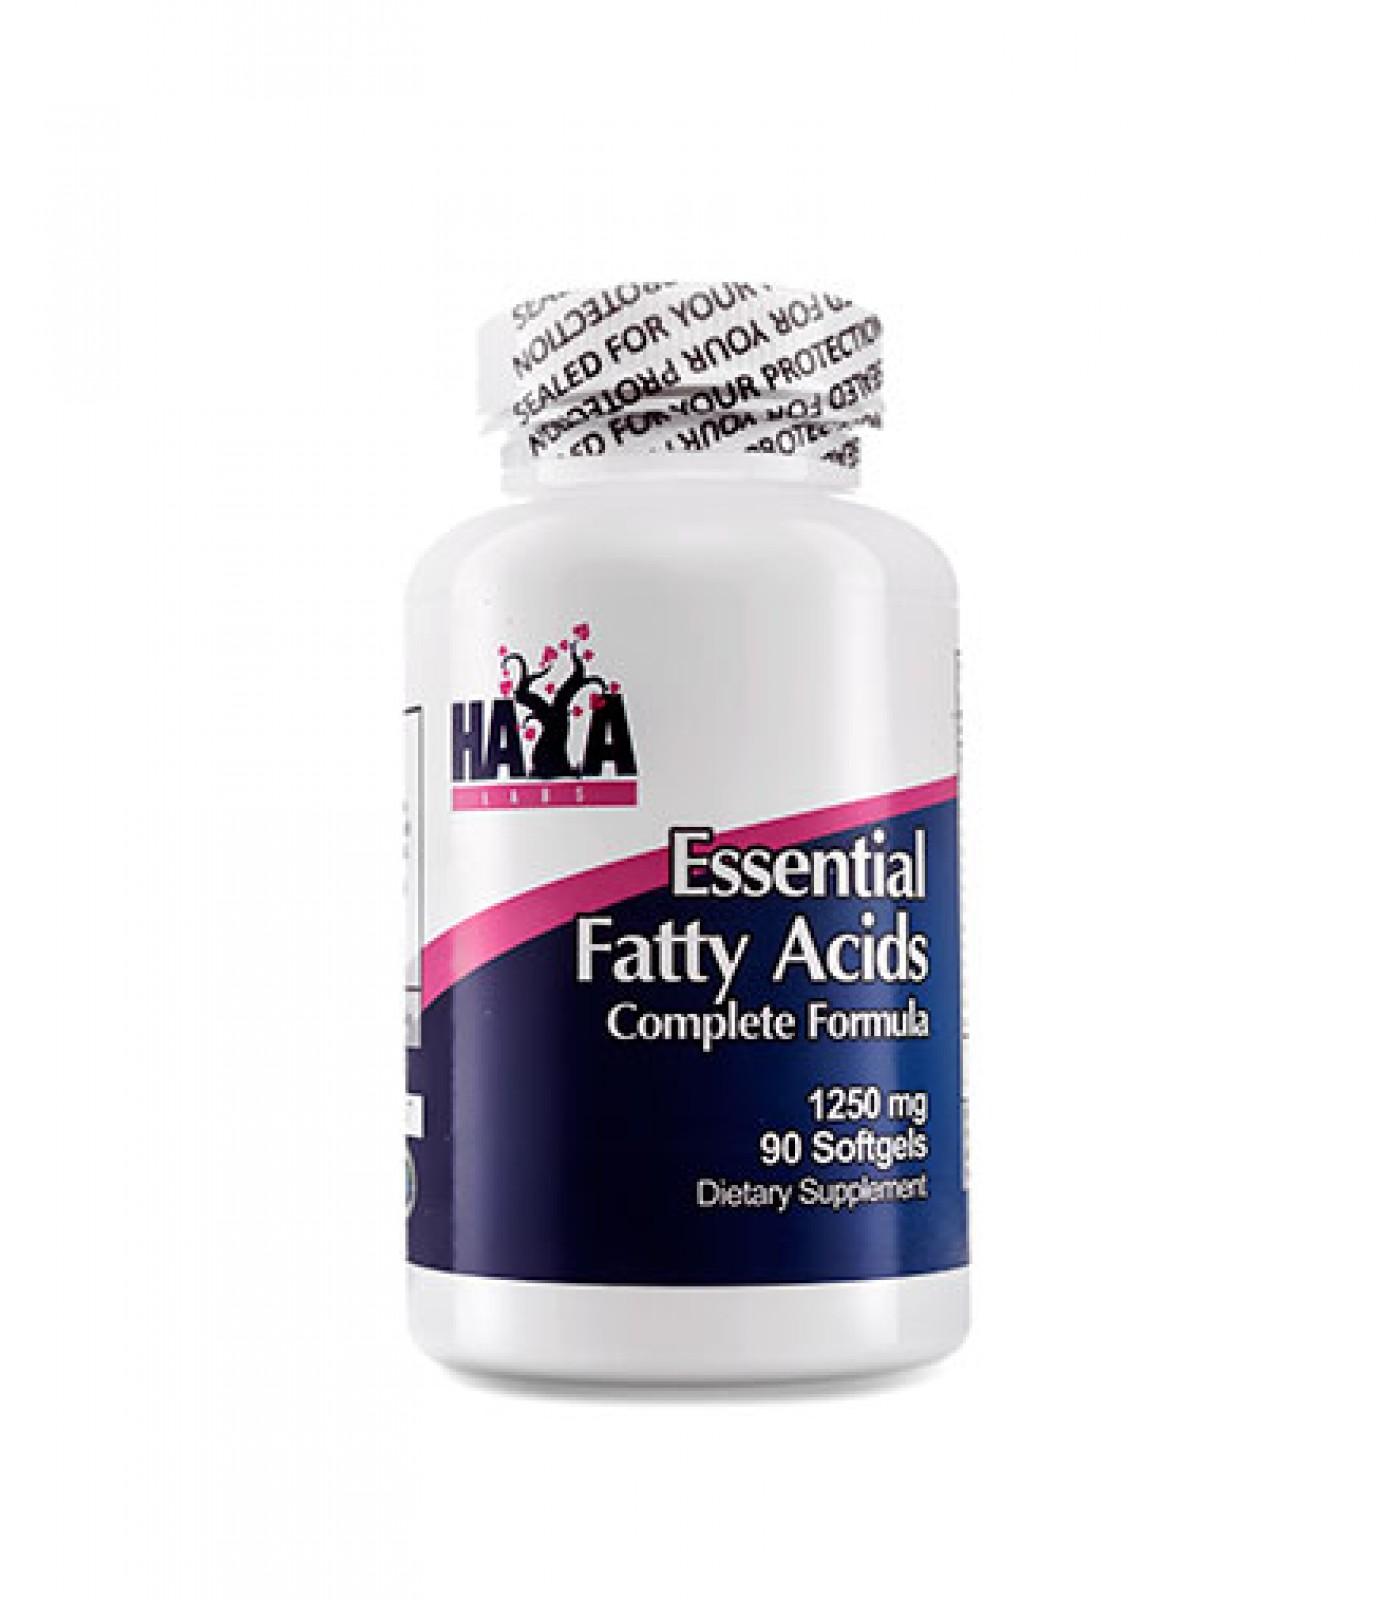 Haya Labs - Essential Fatty Acids 1250mg. / 90 softgels